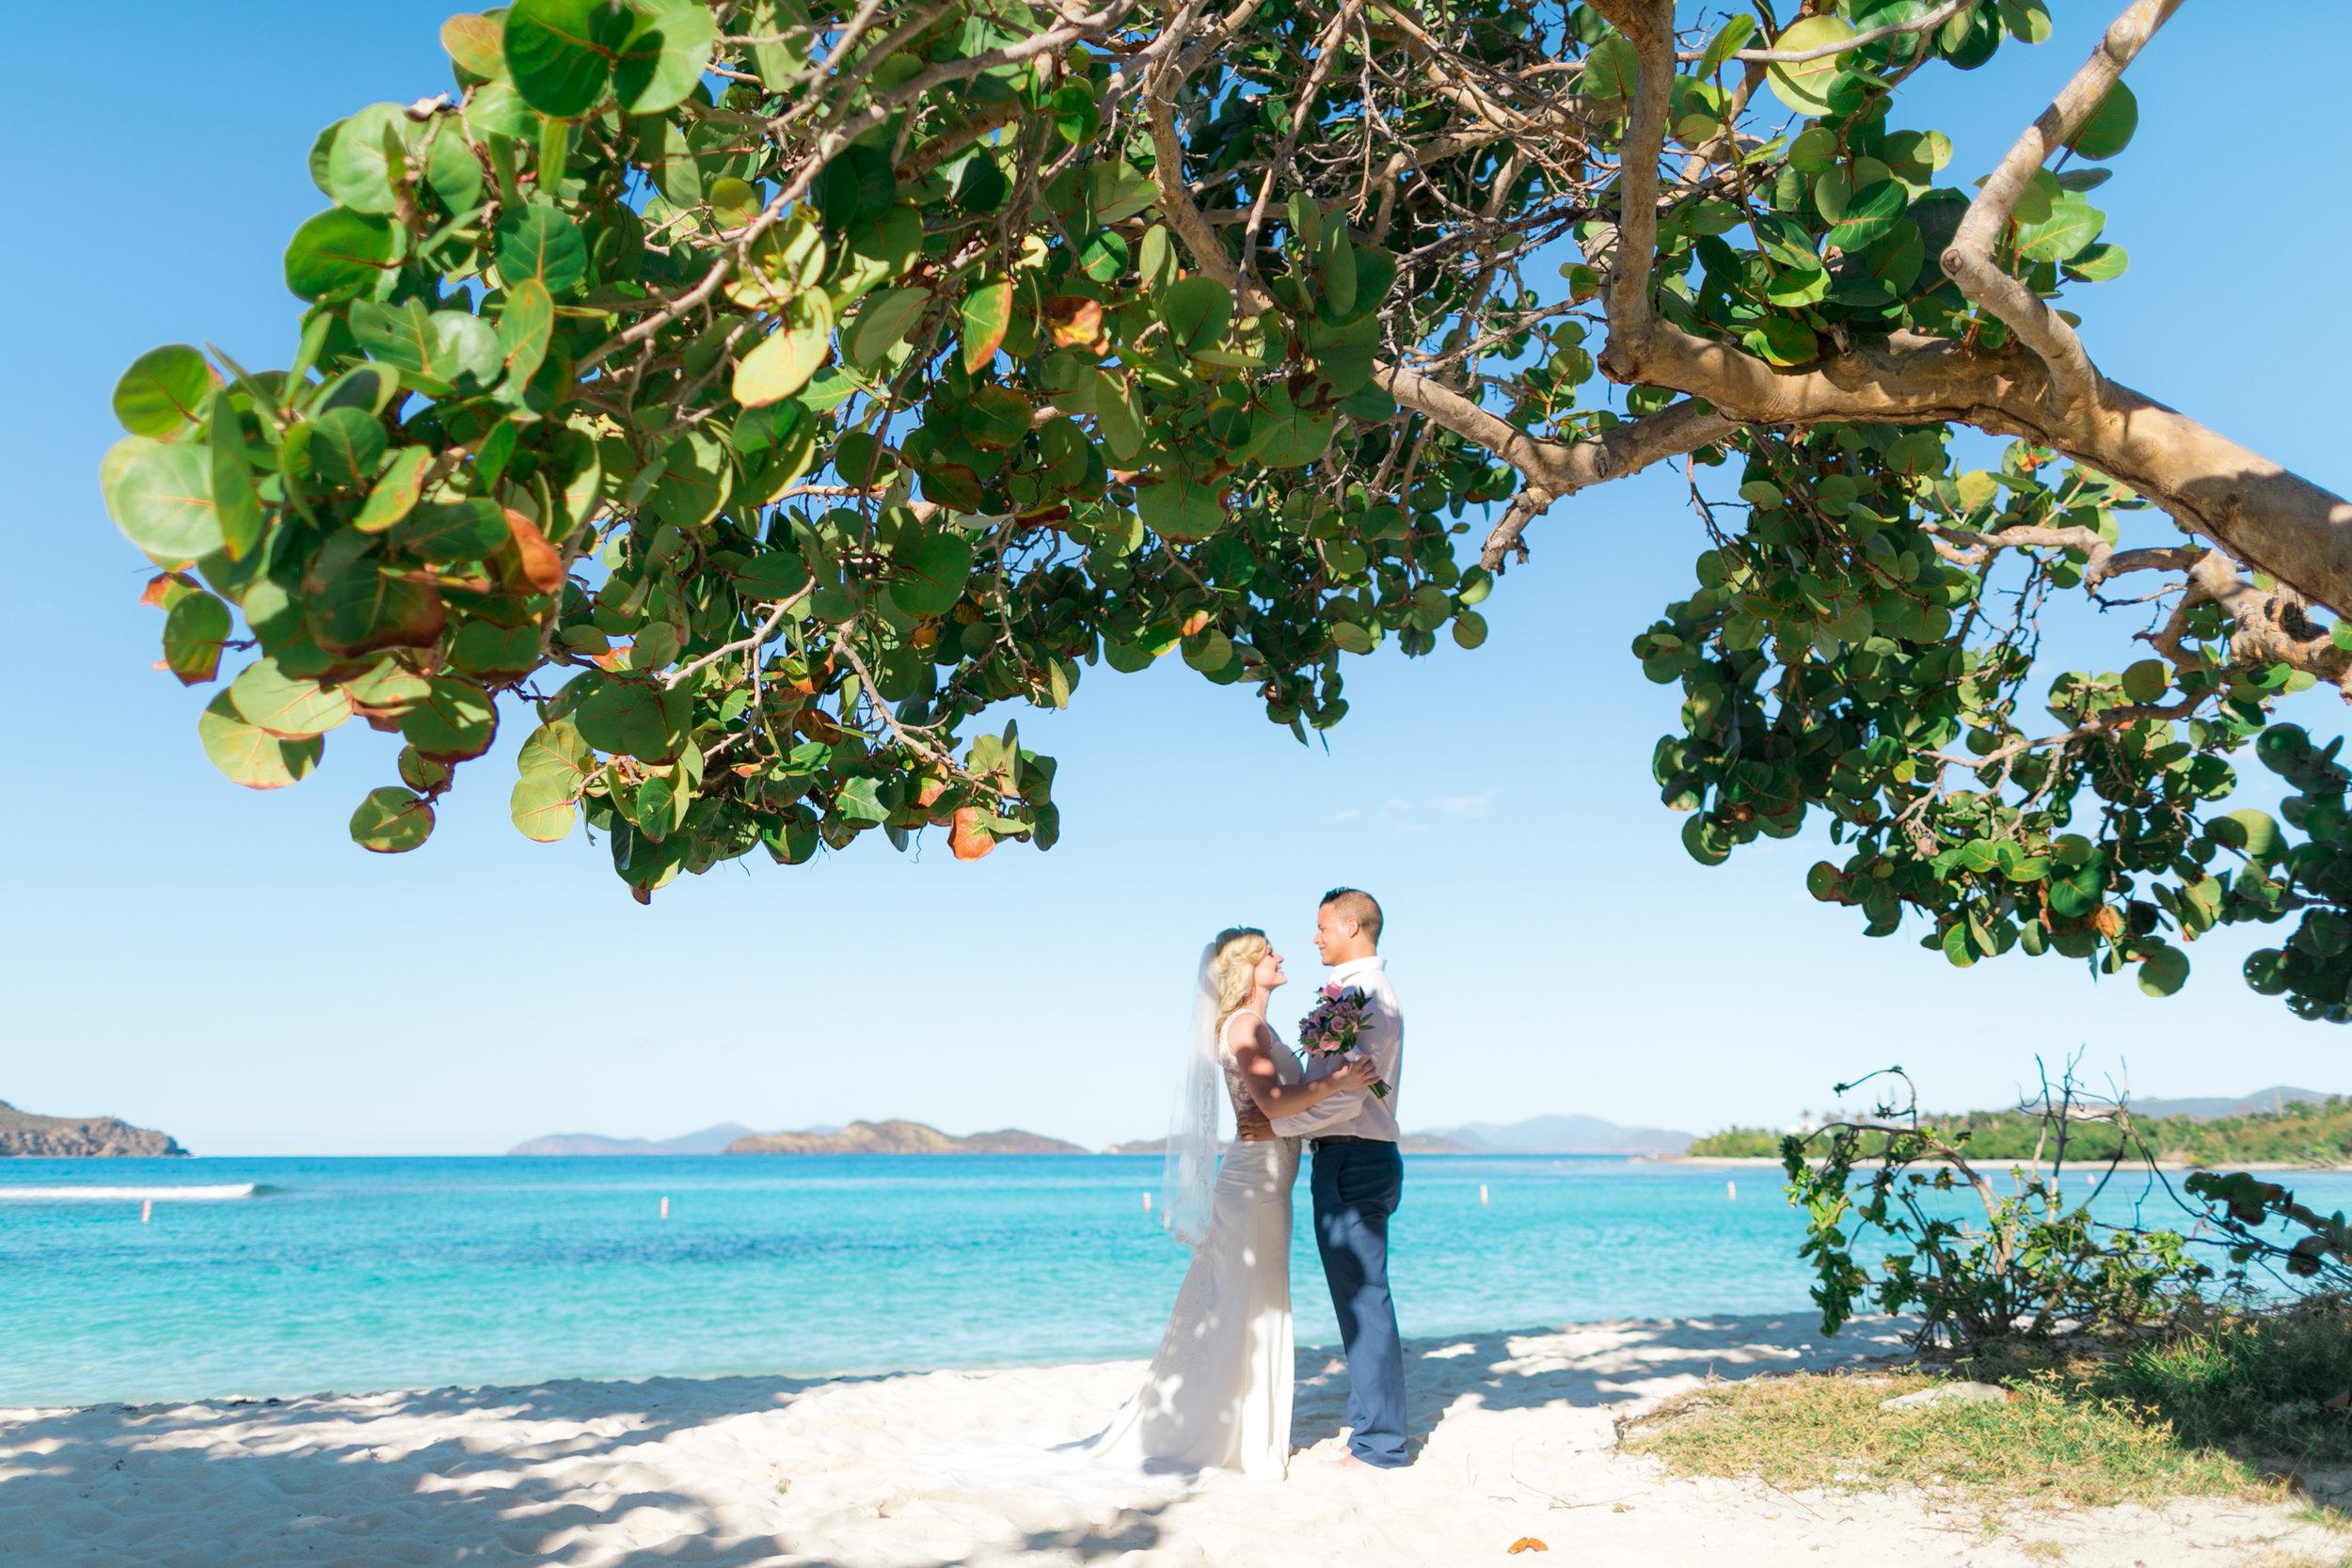 beach-wedding-ceremony-st-thomas